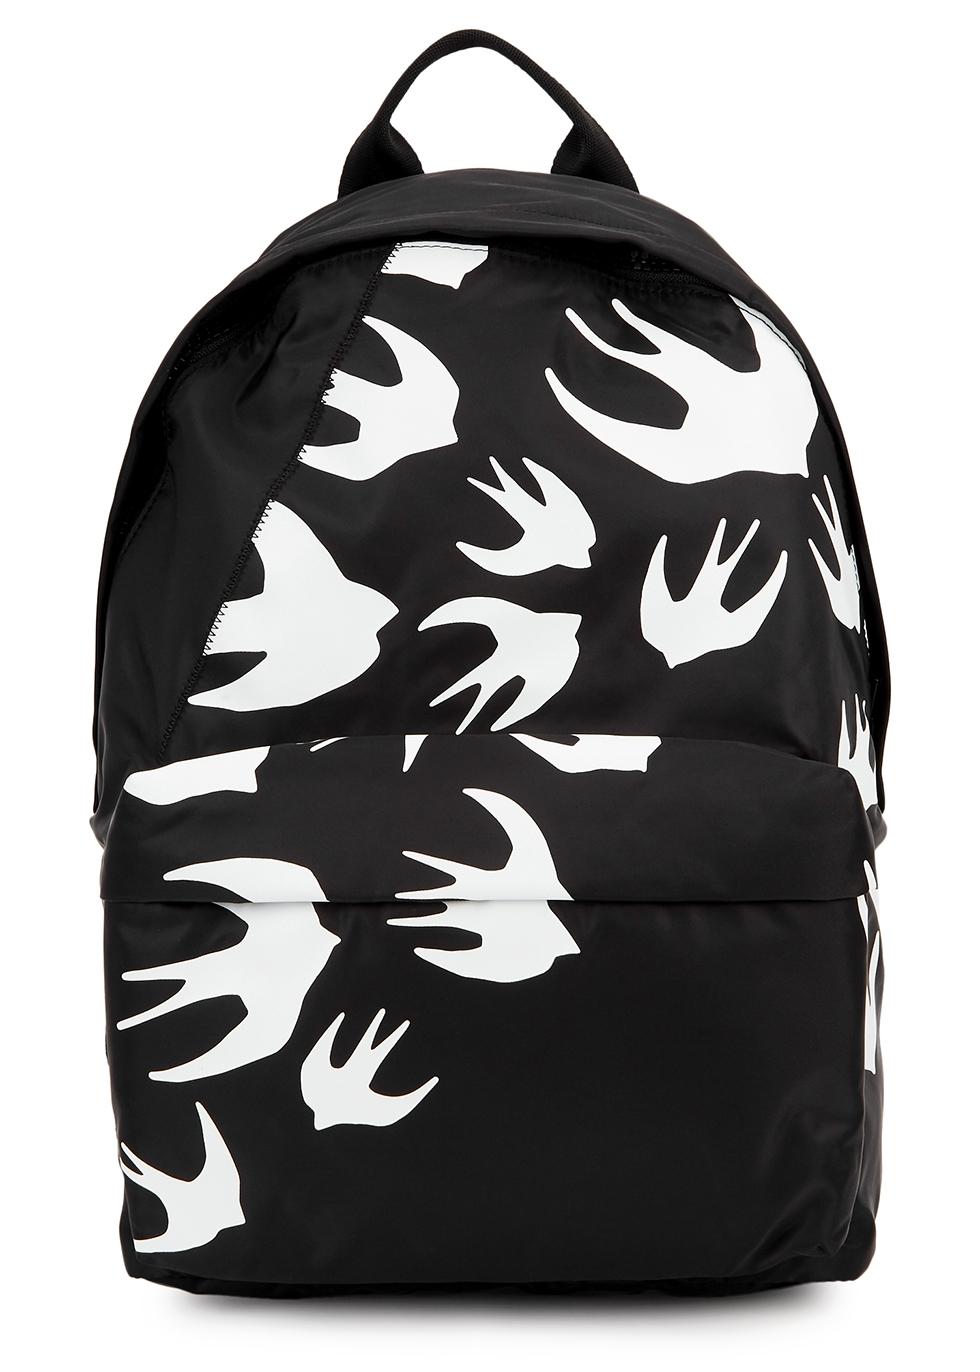 Black swallow-print nylon backpack